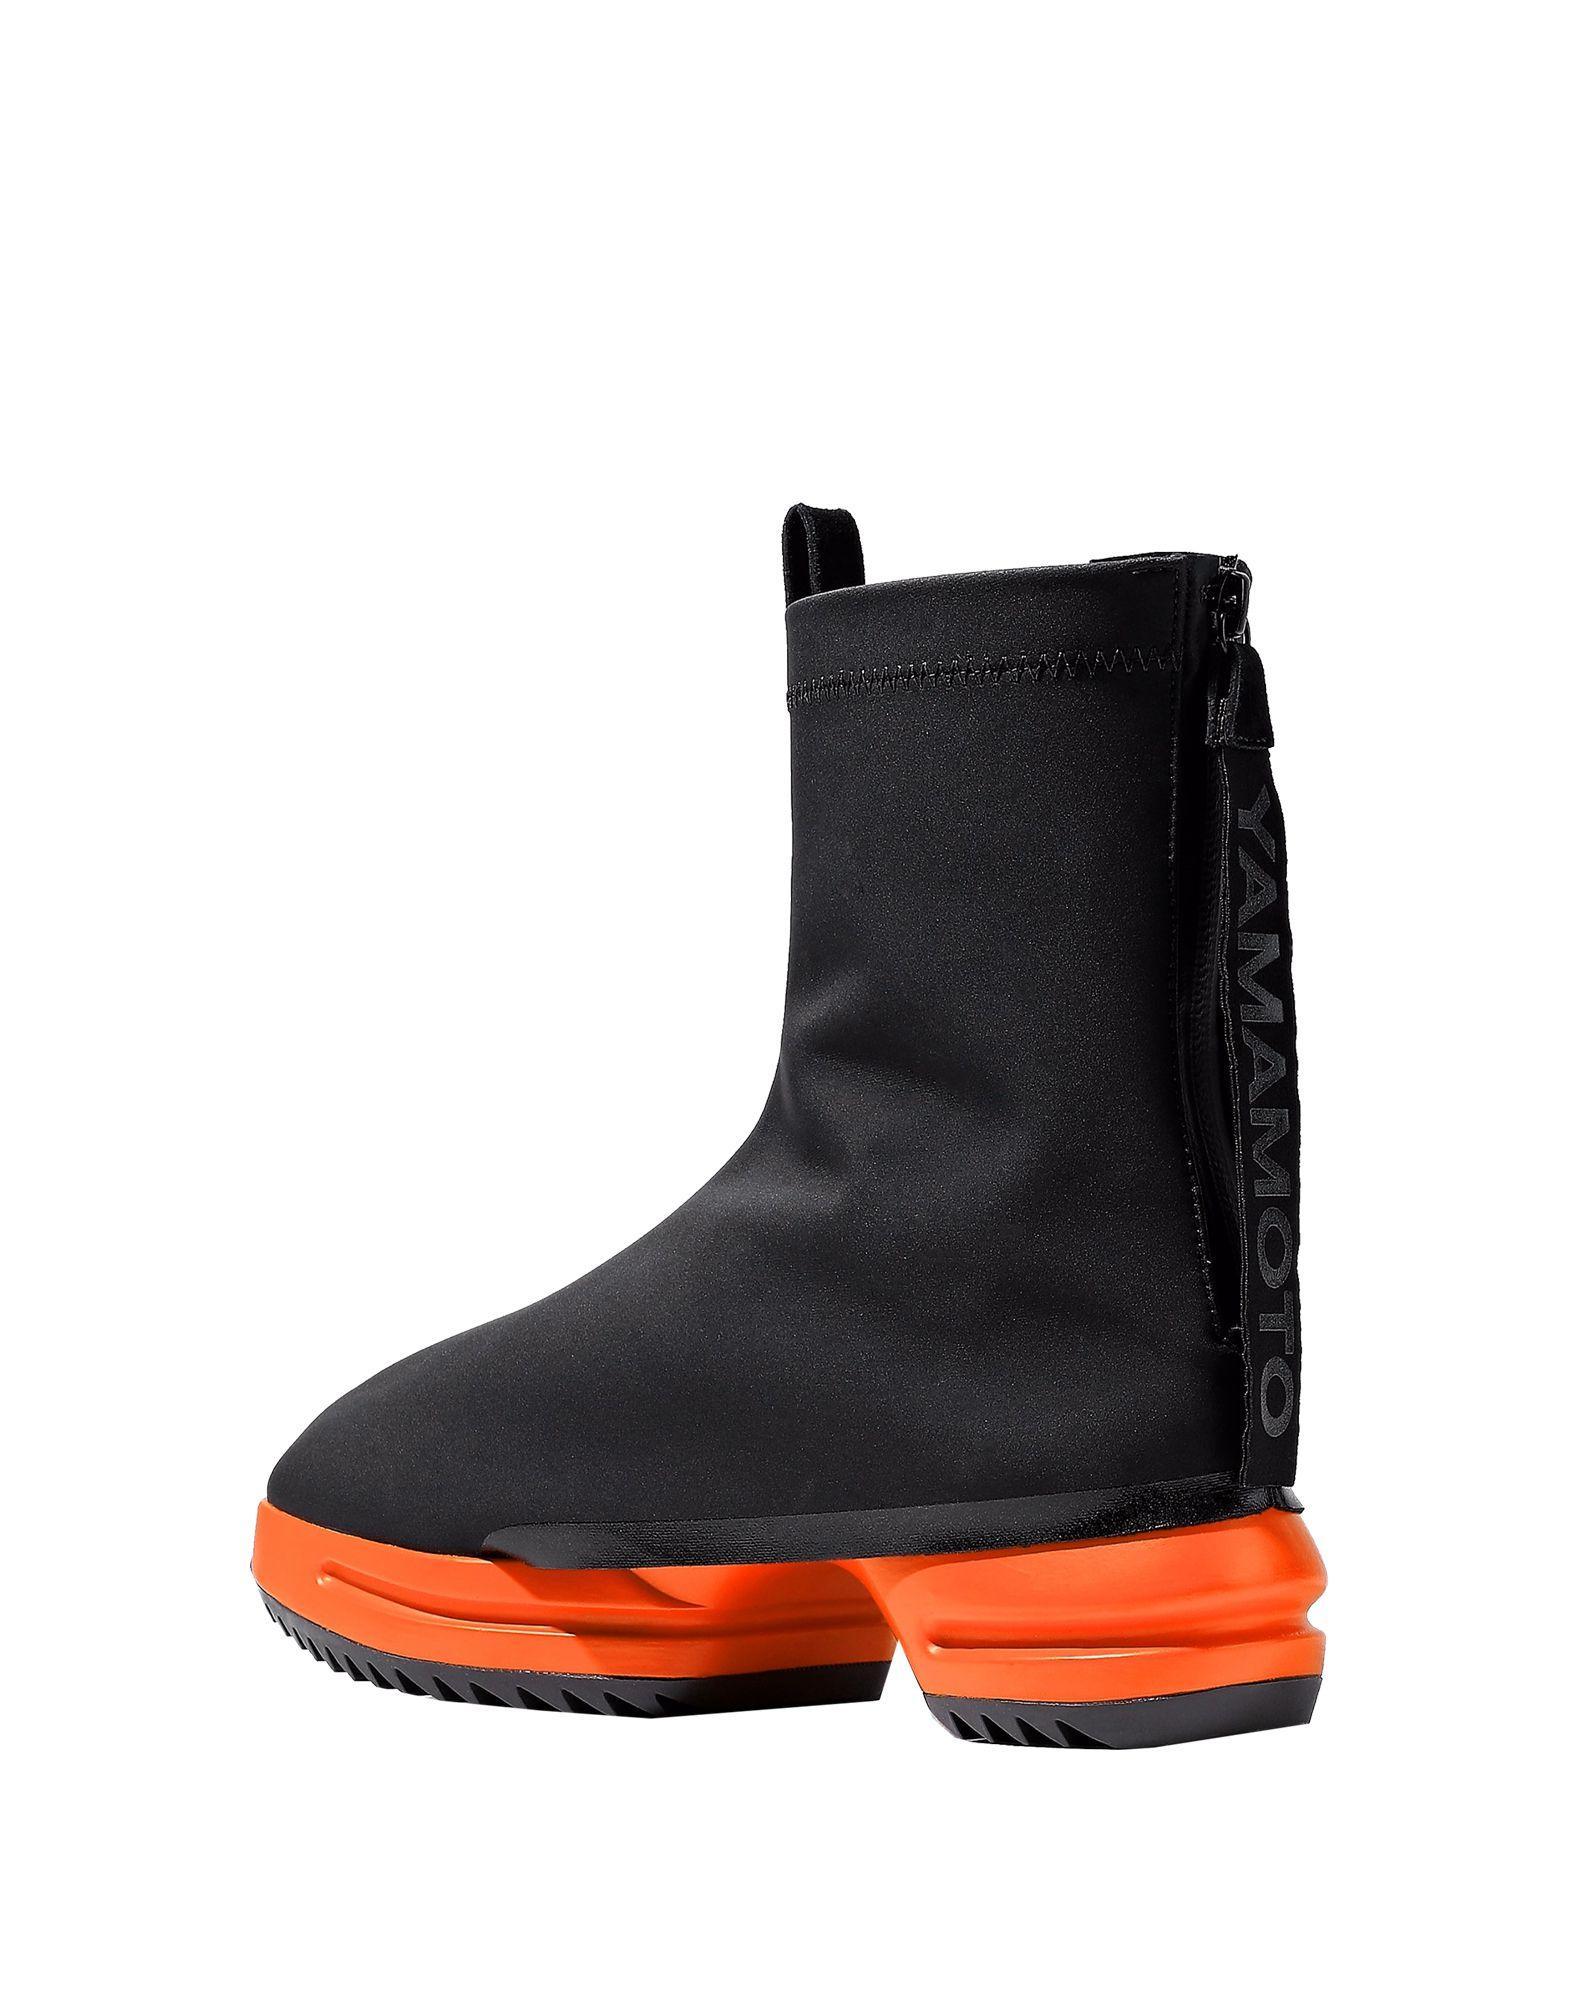 Y-3 Neoprene Ankle Boots in Black